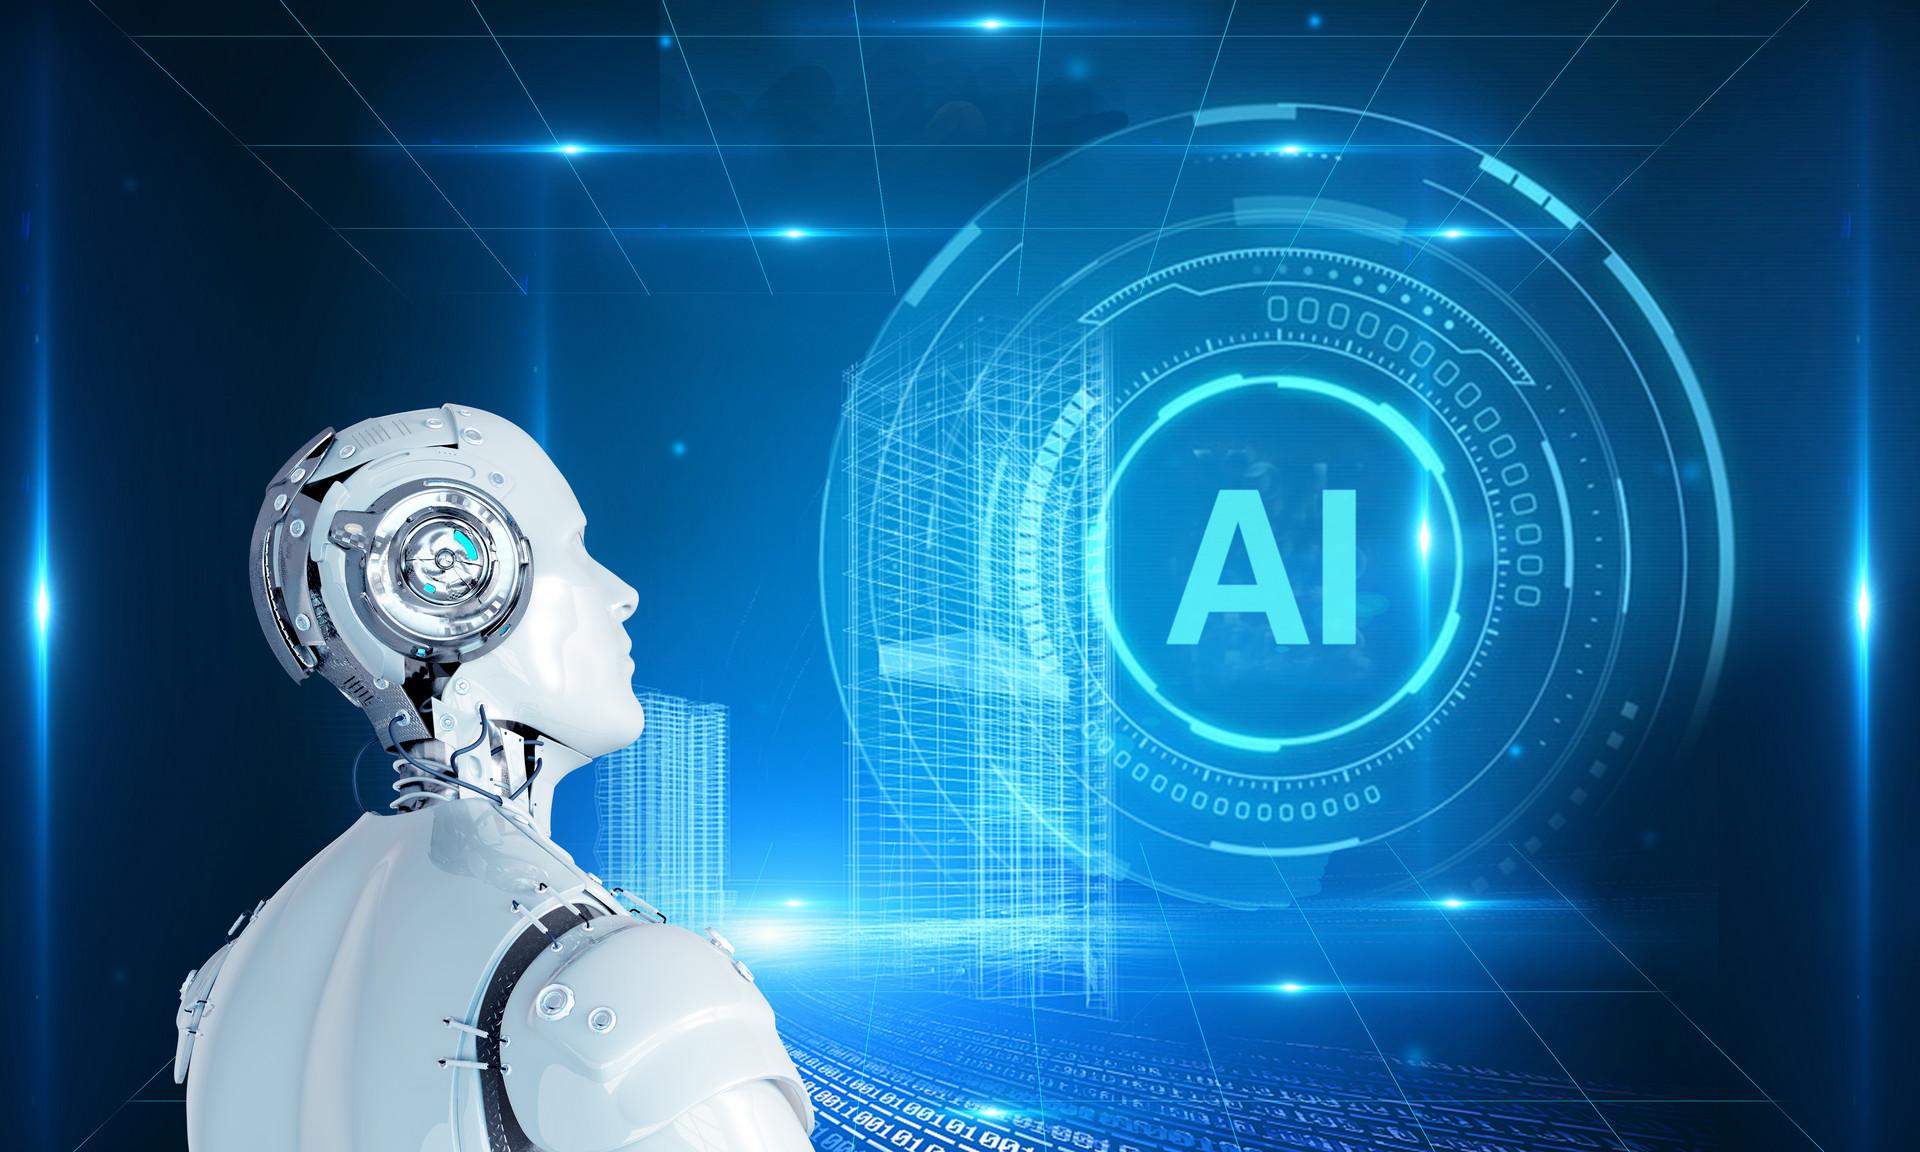 AI 人工智能加持解锁设备智能维修新姿势